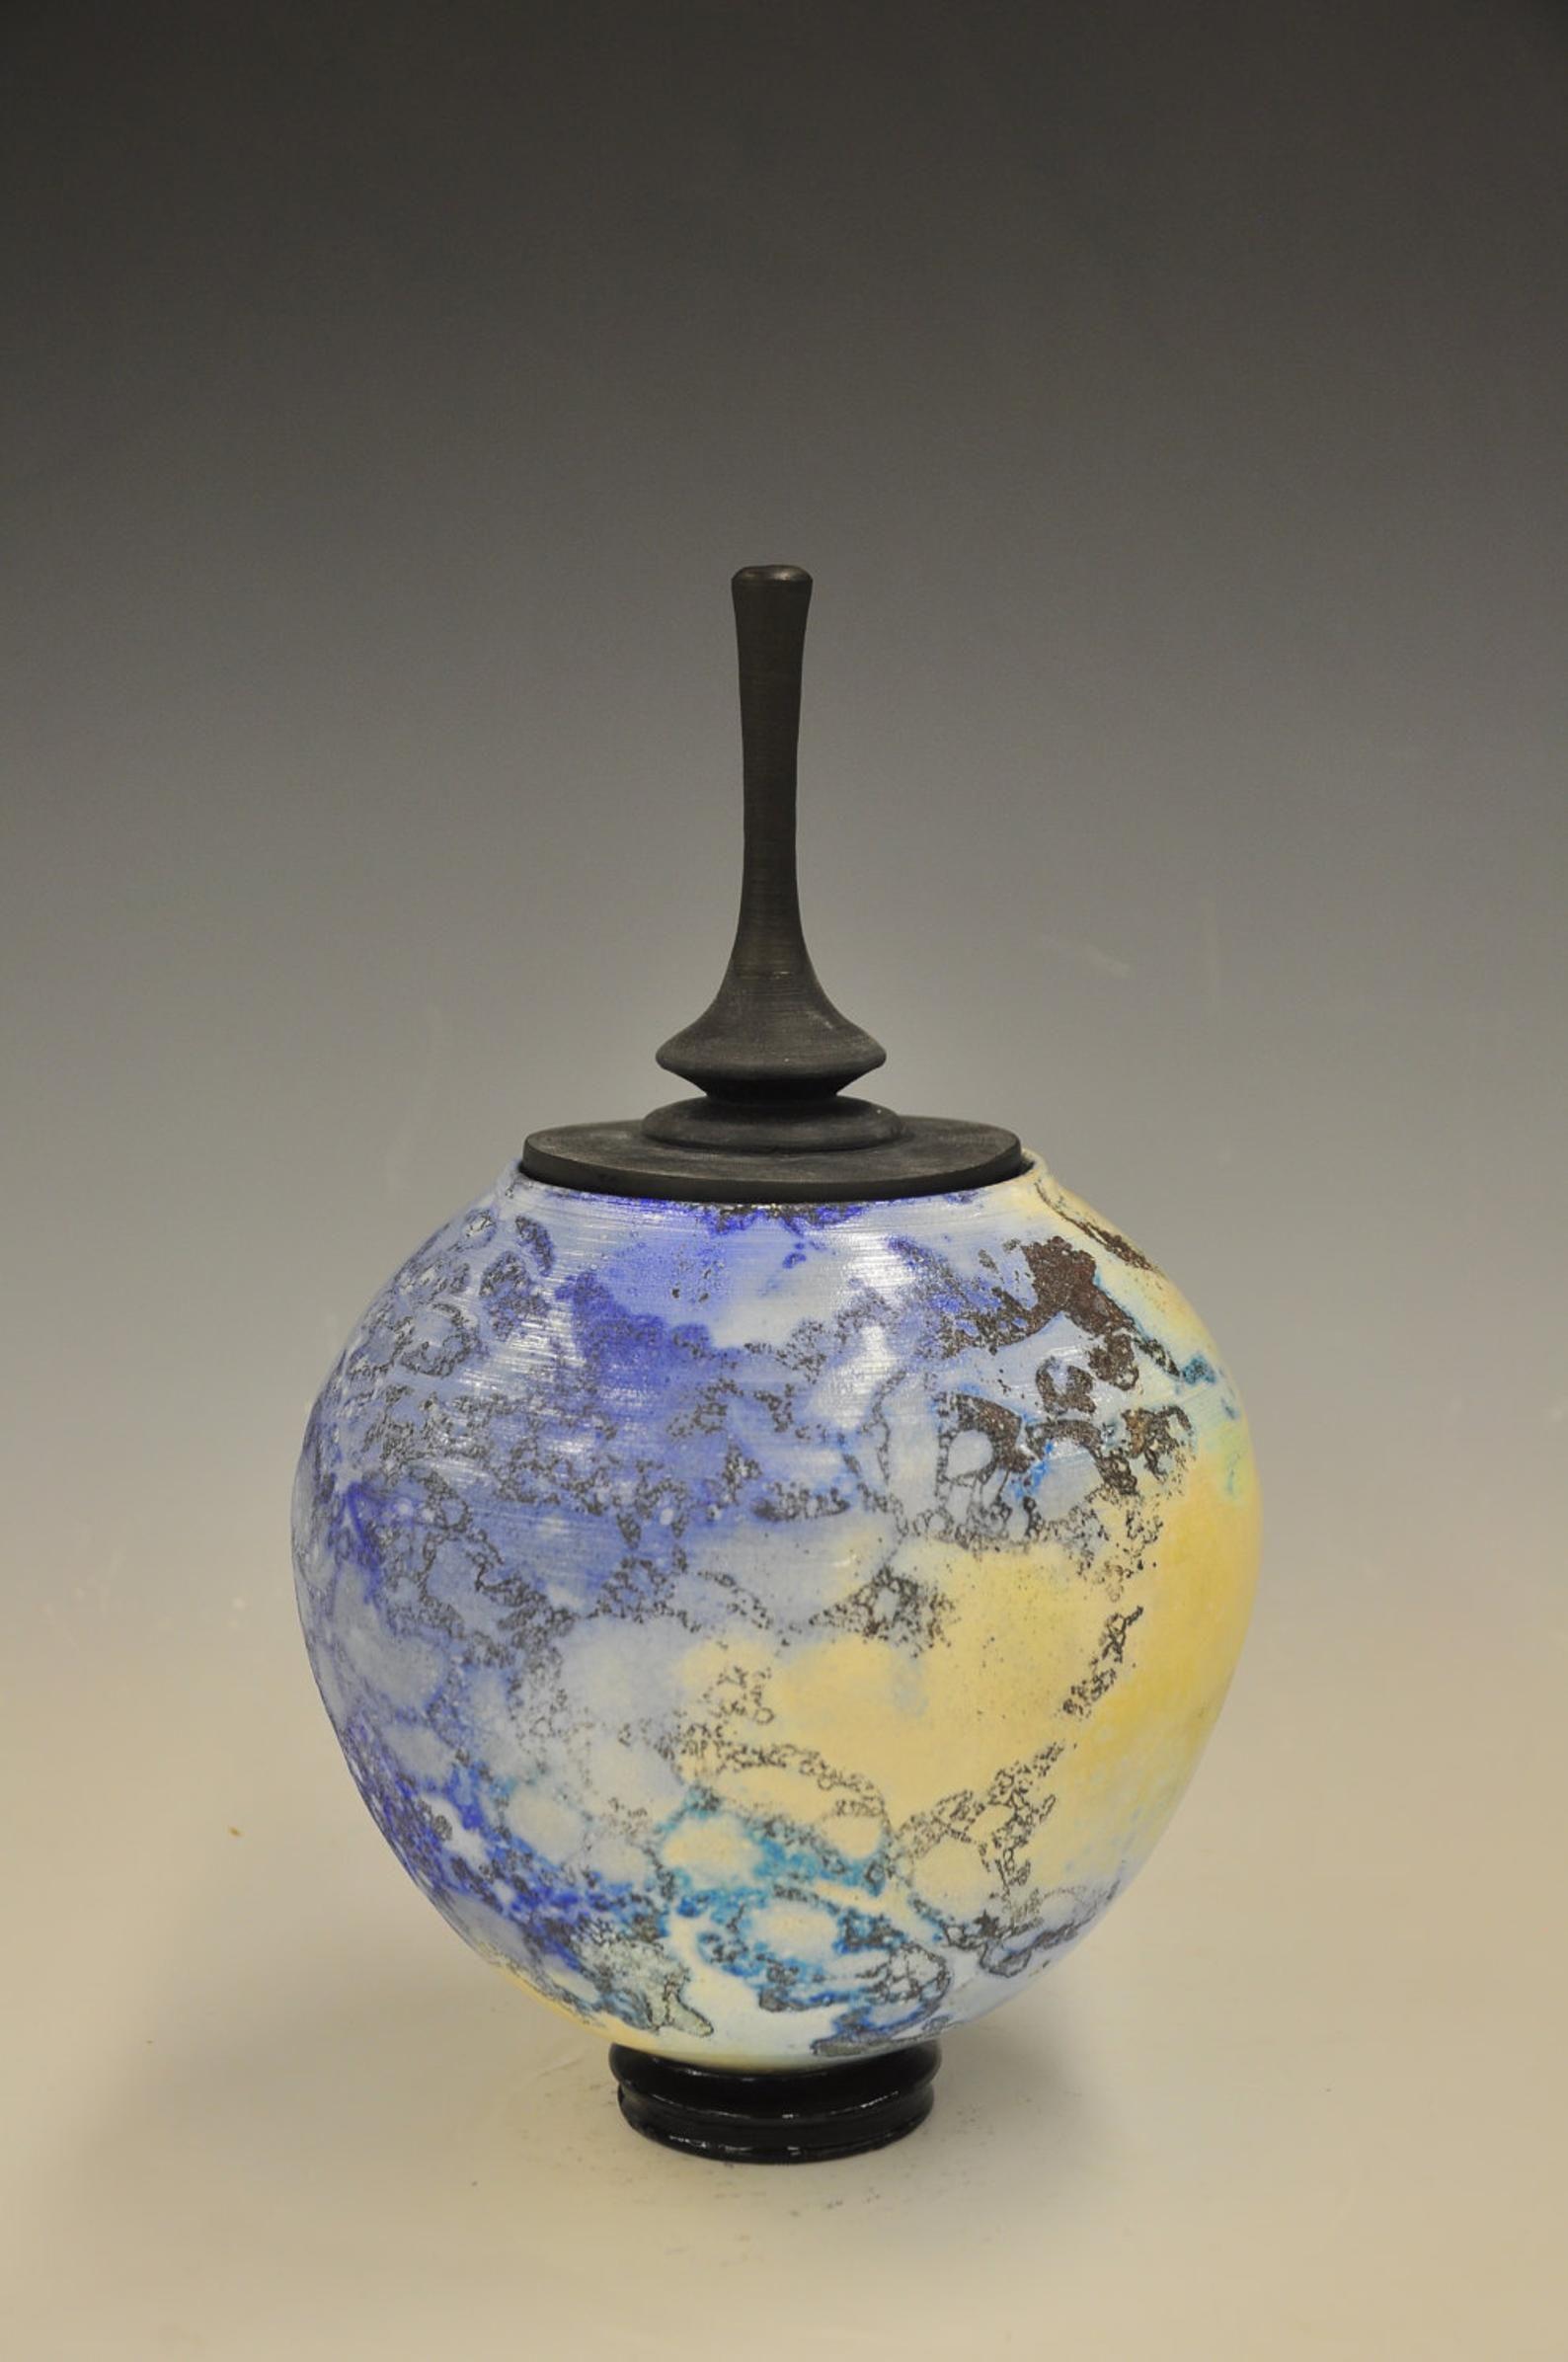 Alternative raku sagger pottery glazed with soluble metal